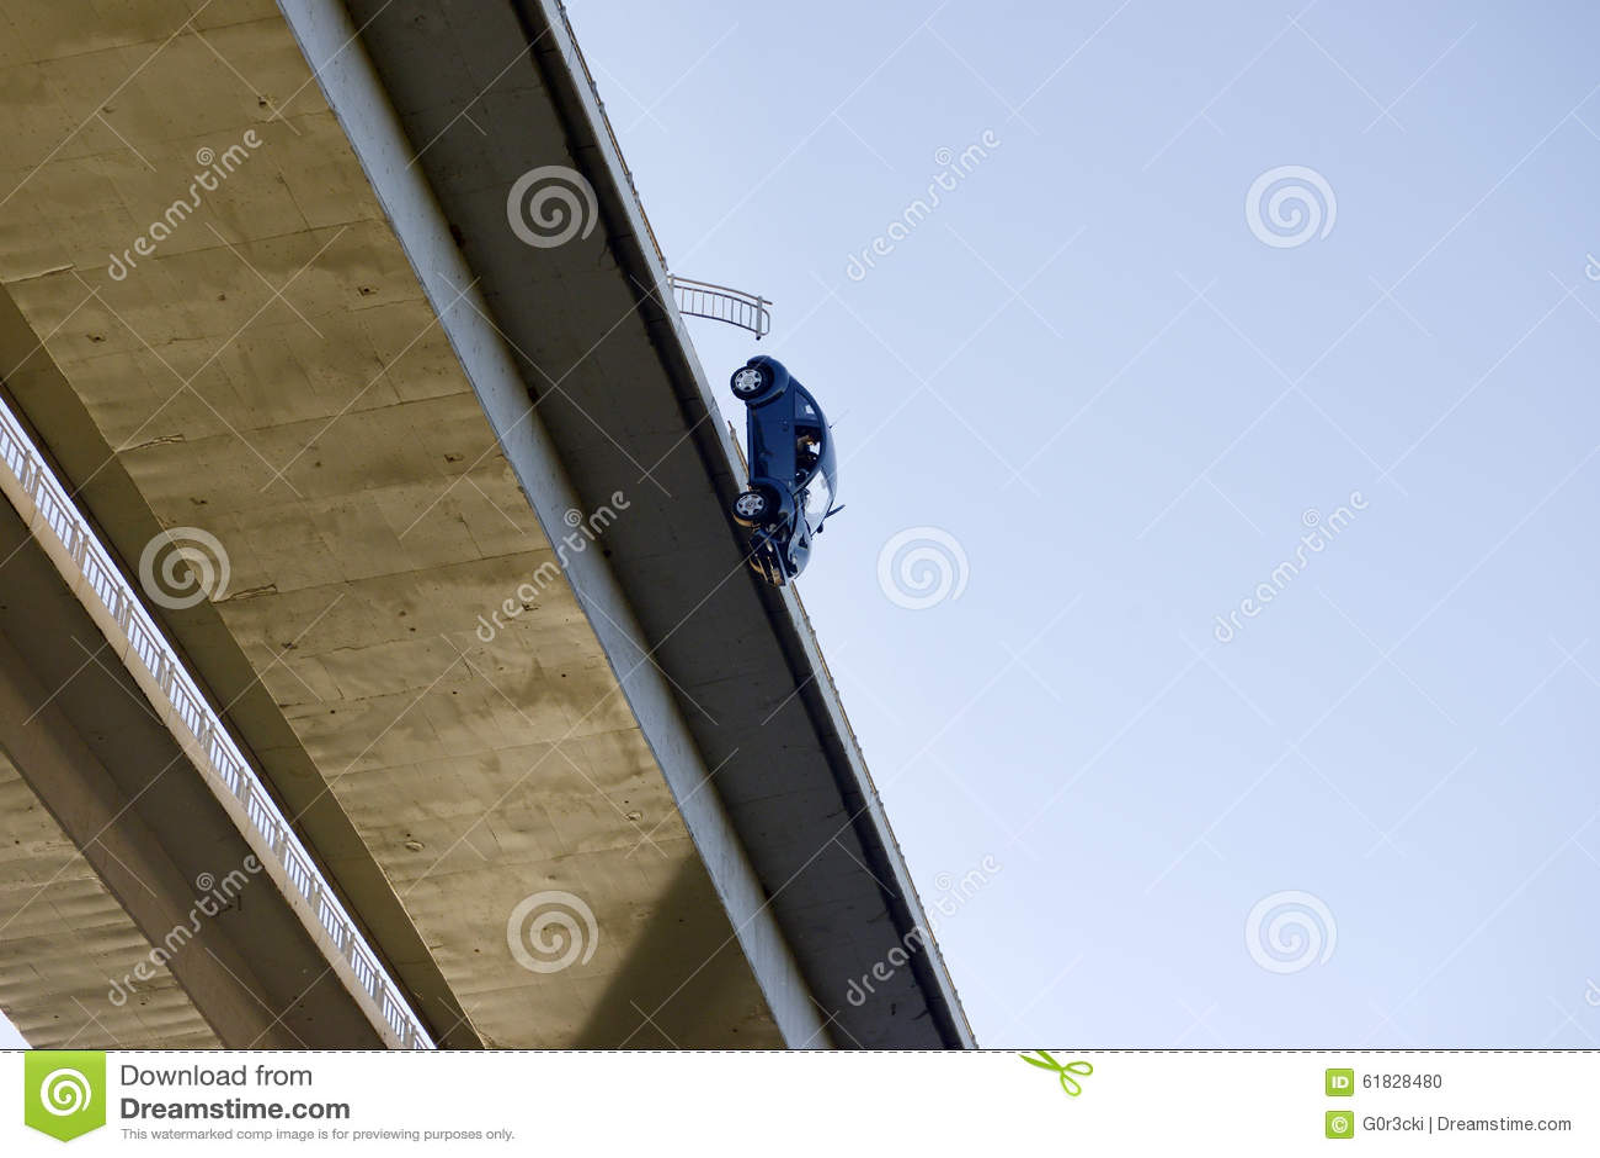 Incidente stradale, cadente dal ponte, romanzo, realtà